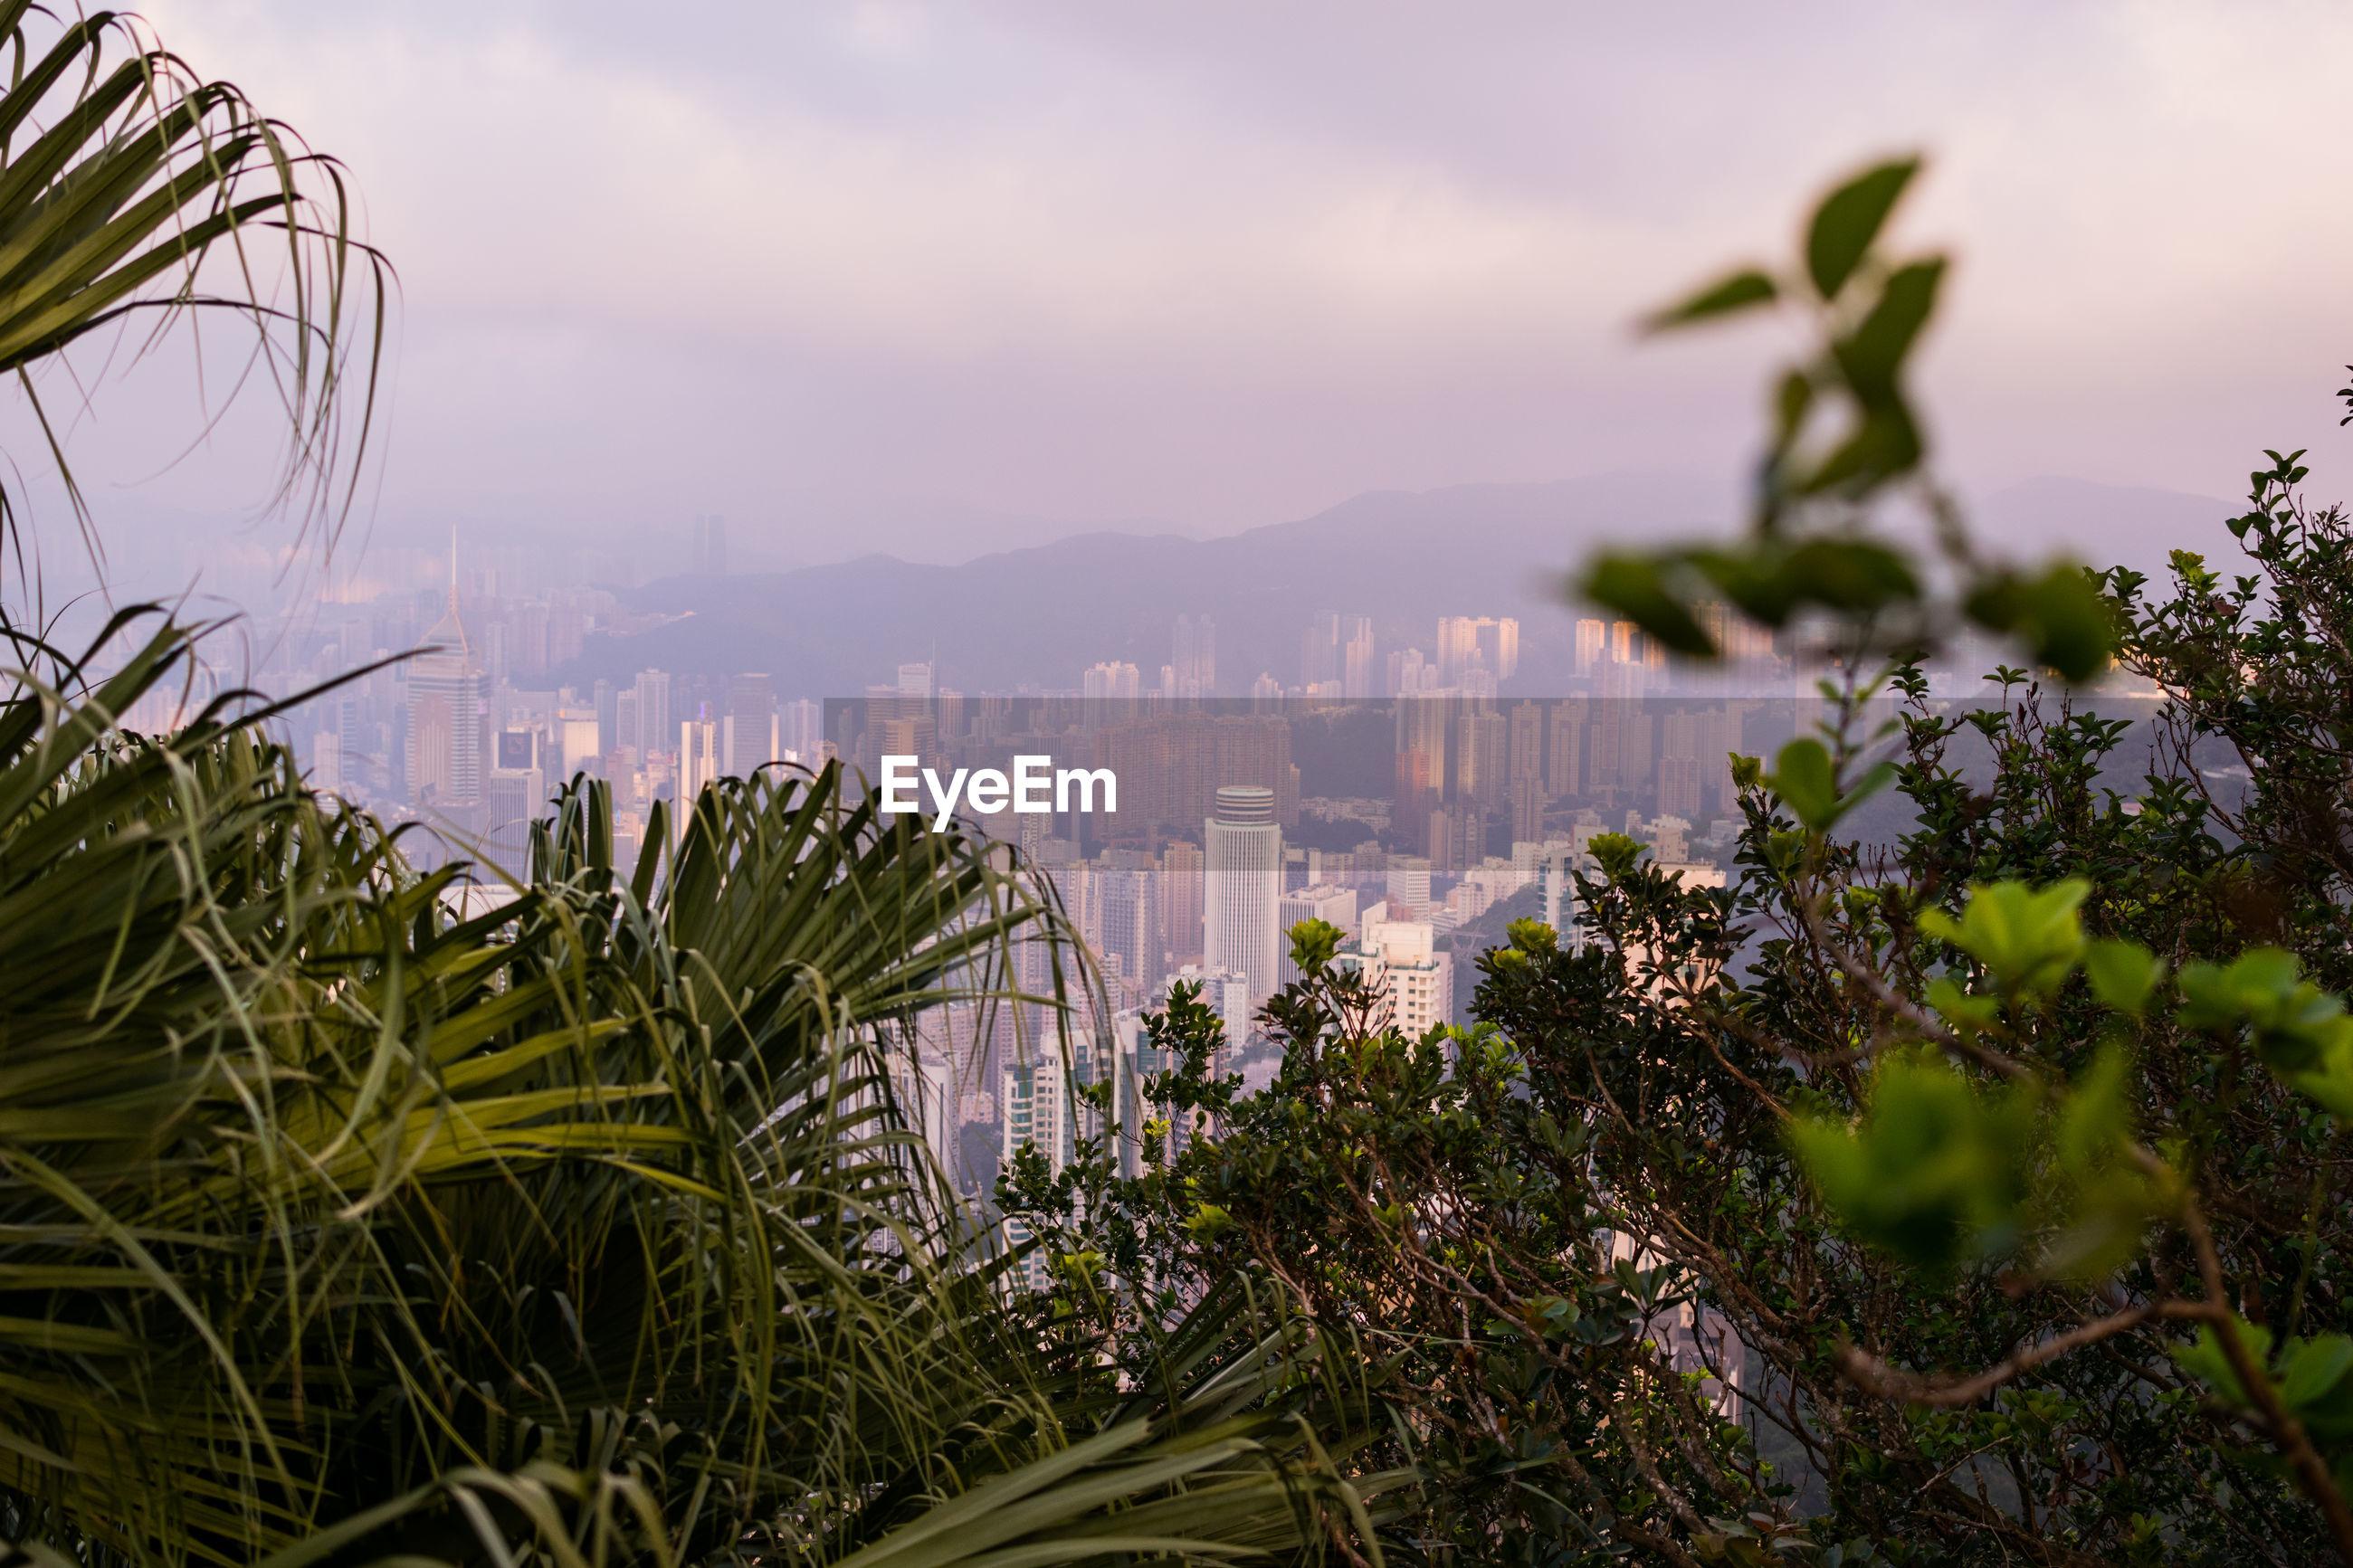 PLANTS GROWING BY BUILDINGS AGAINST SKY